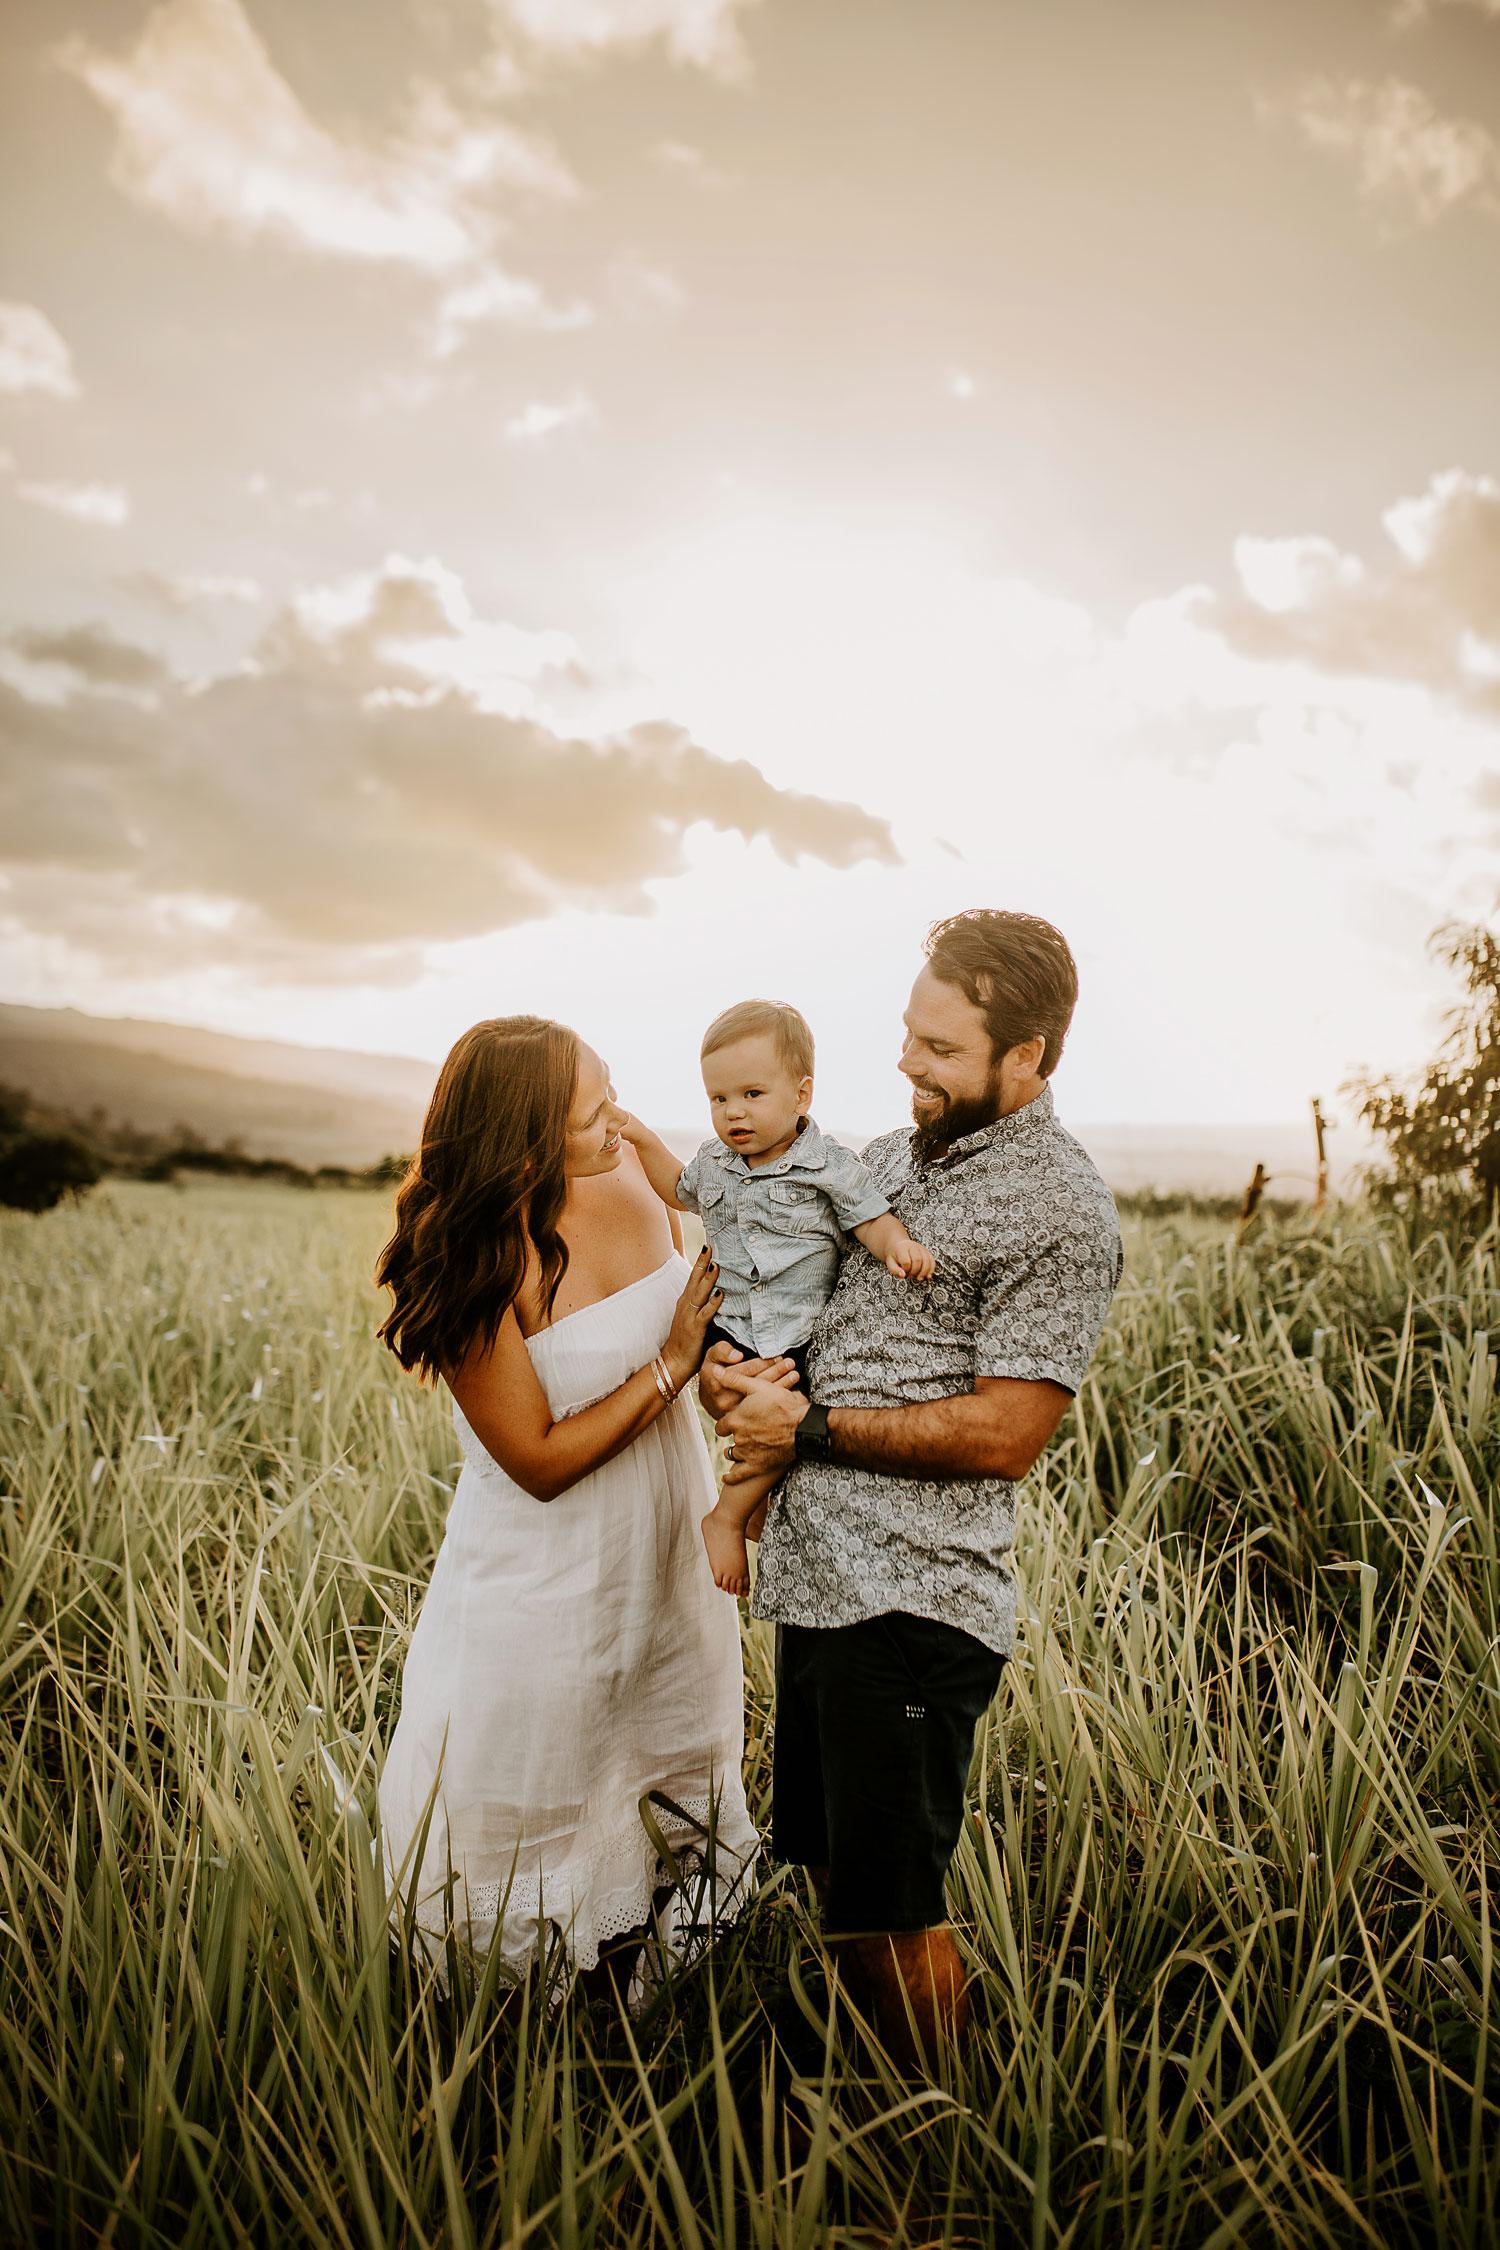 North-Shore-Family-Photographer08.jpg